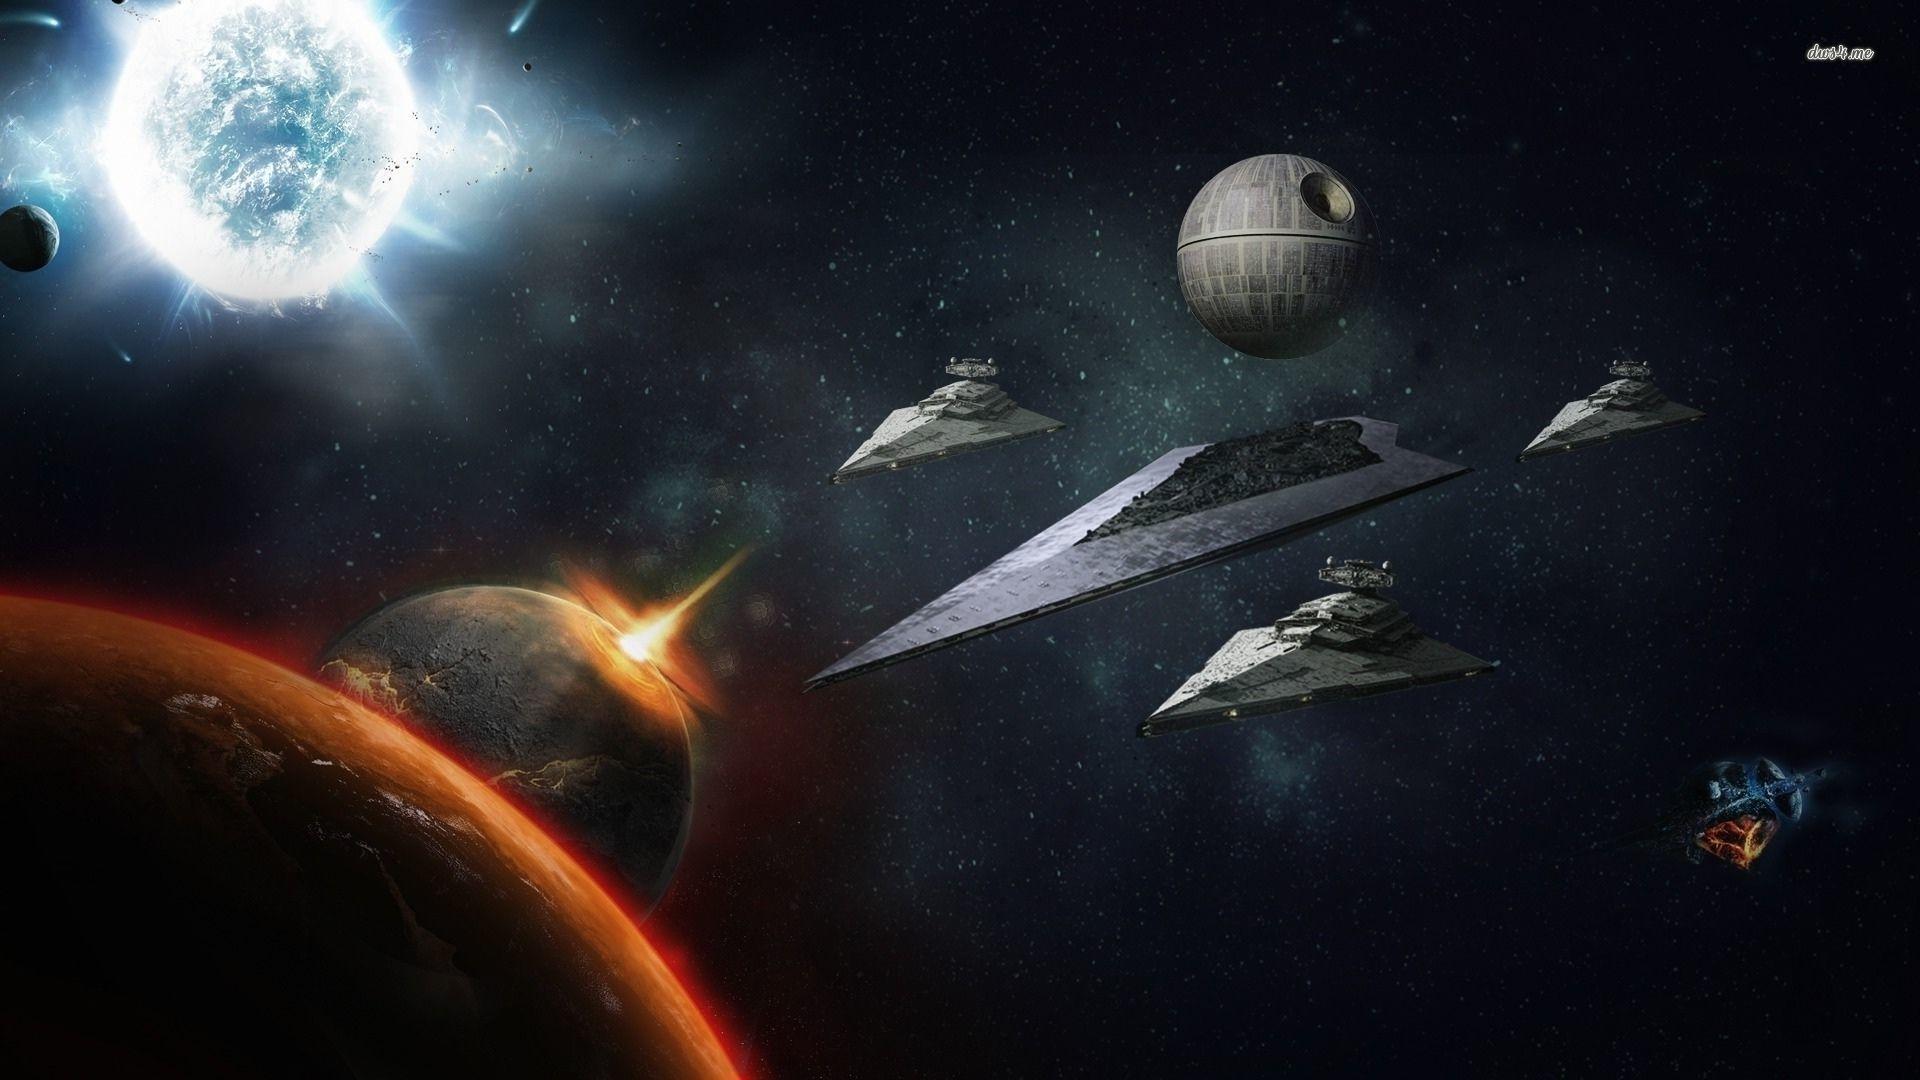 10 Top Death Star Wallpaper 1920X1080 FULL HD 1080p For PC ...